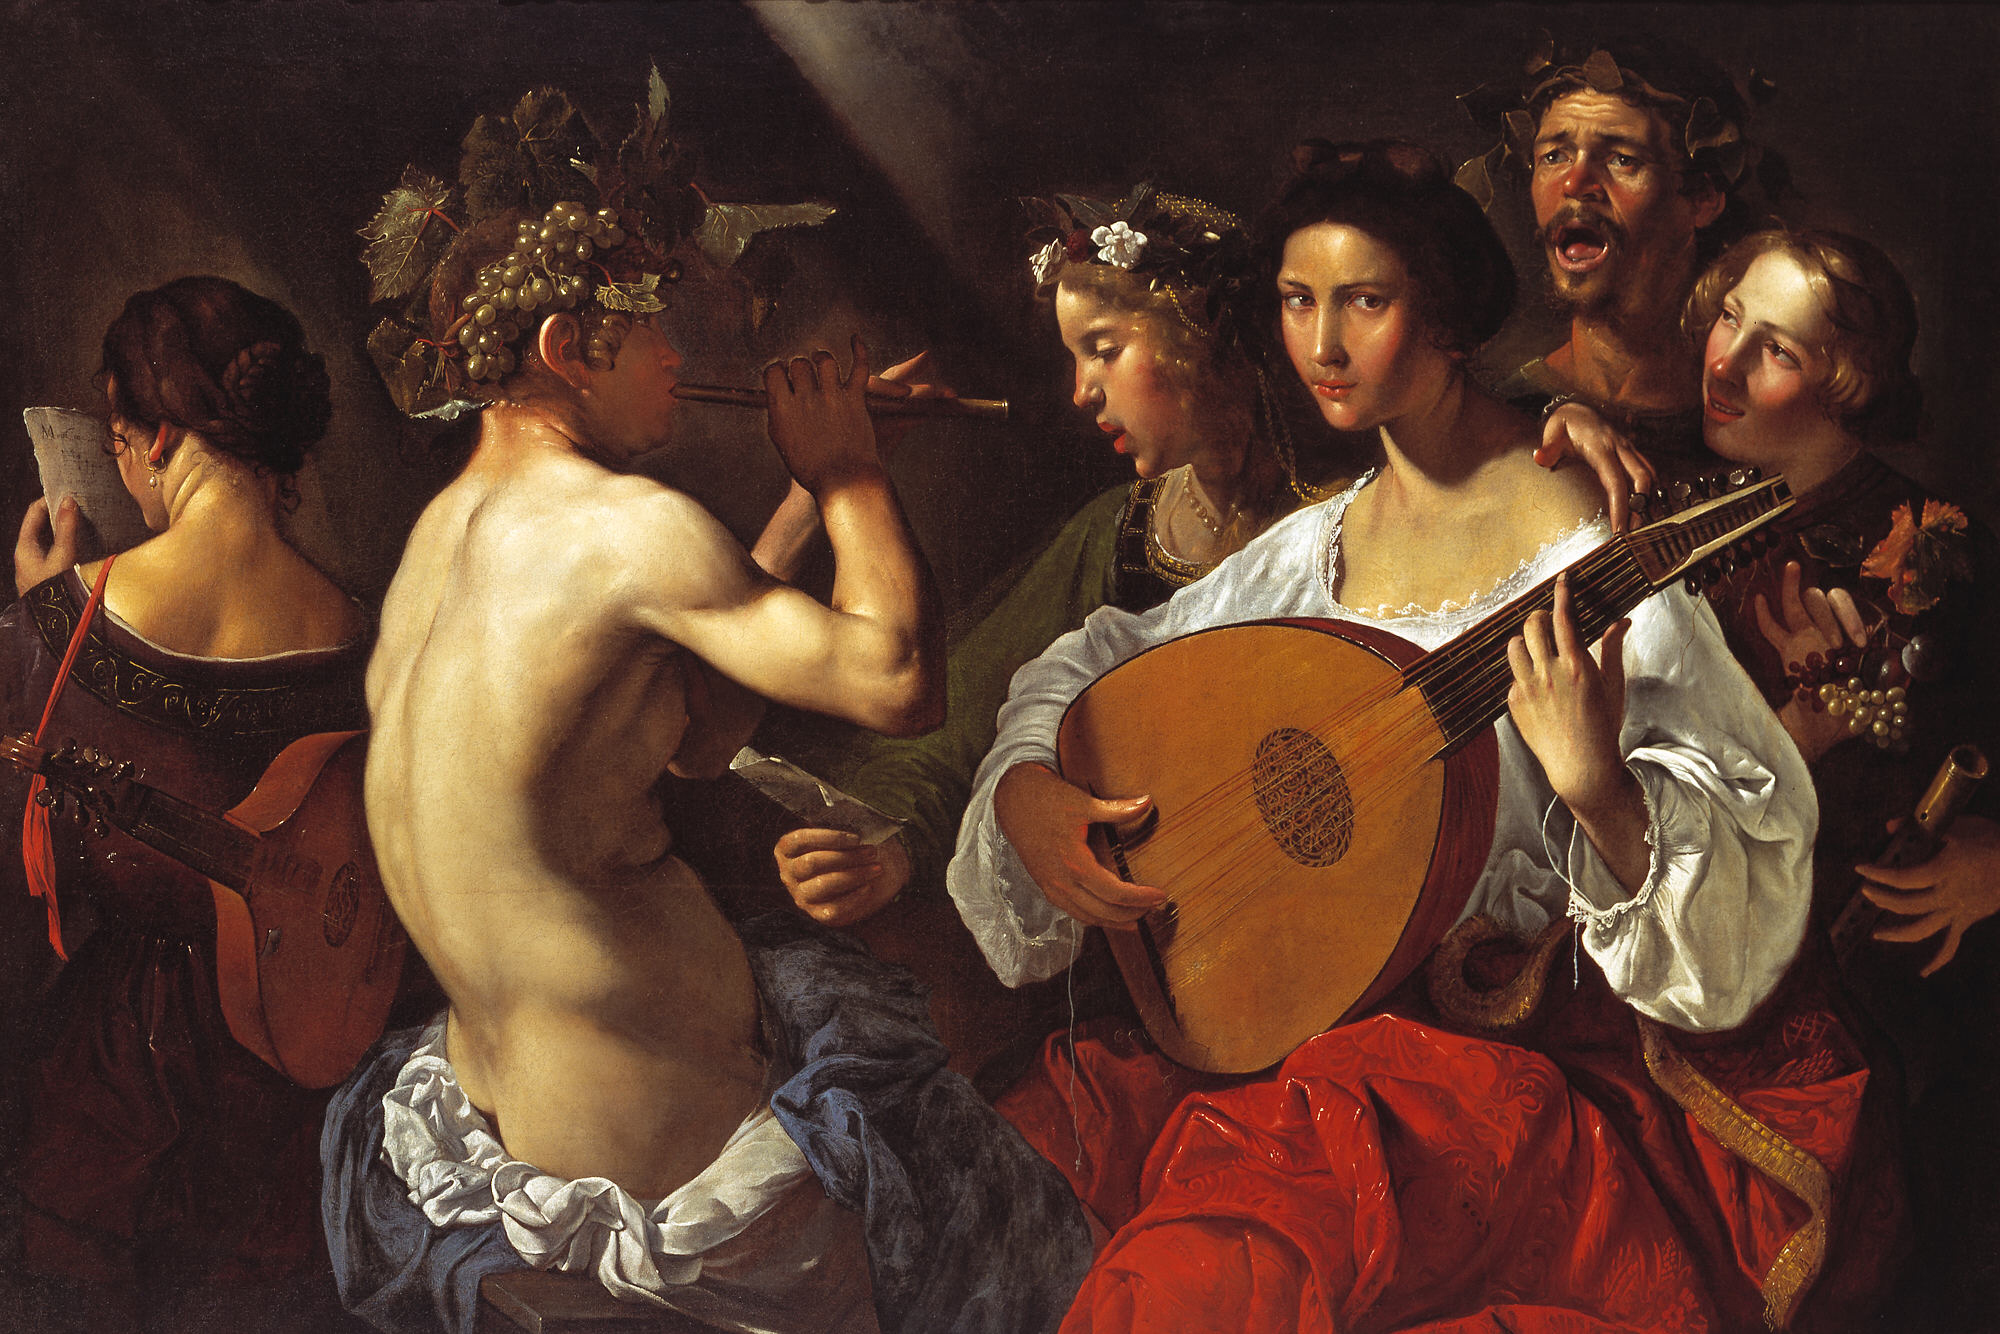 File:Bacchic Concert - Paolini (1625).jpg